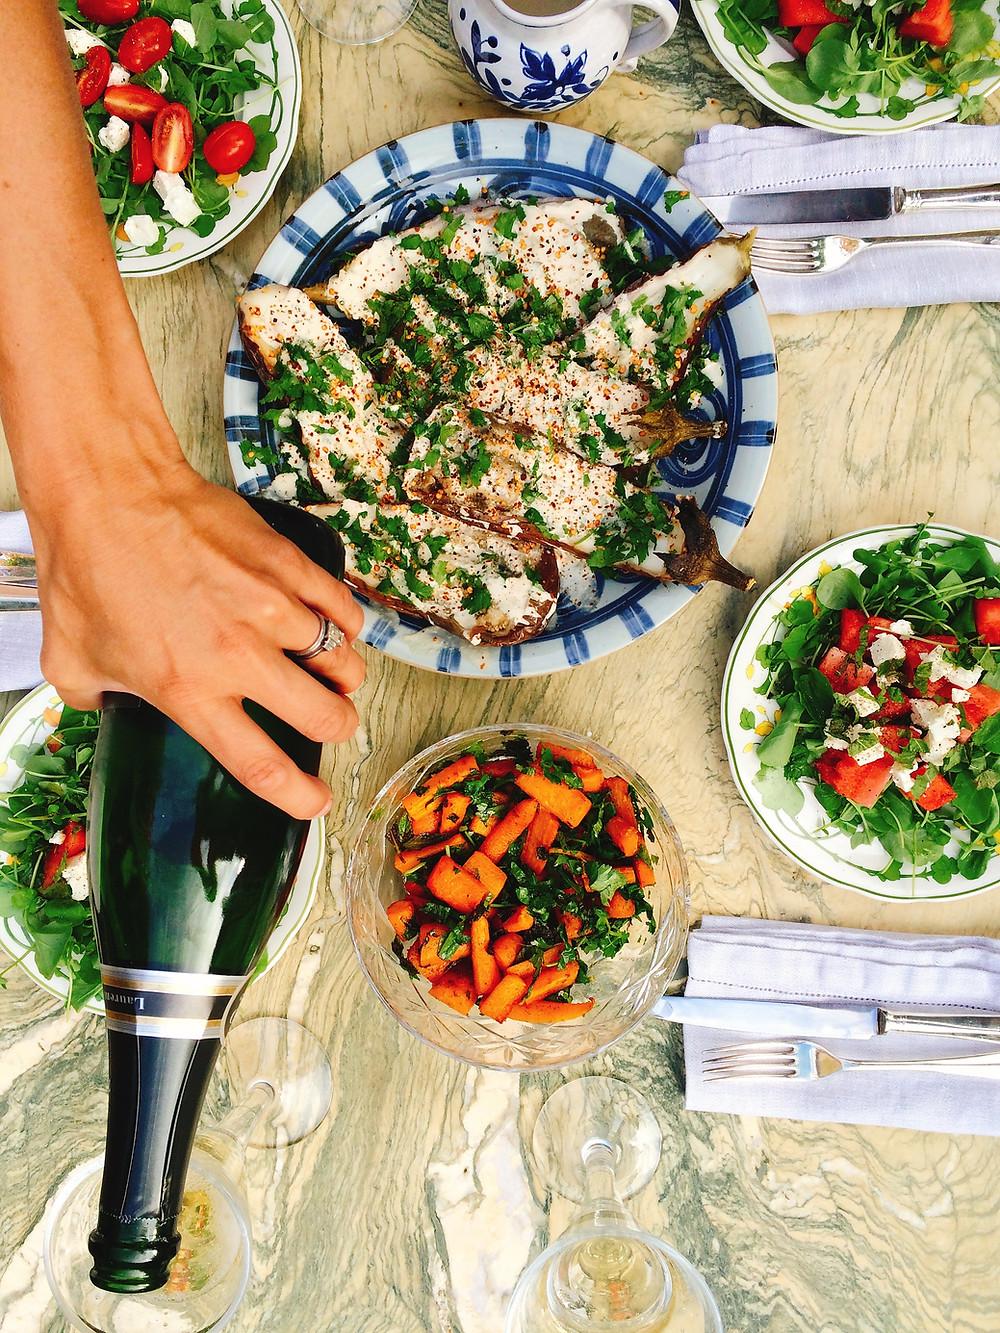 watermelon, feta and watercress salad